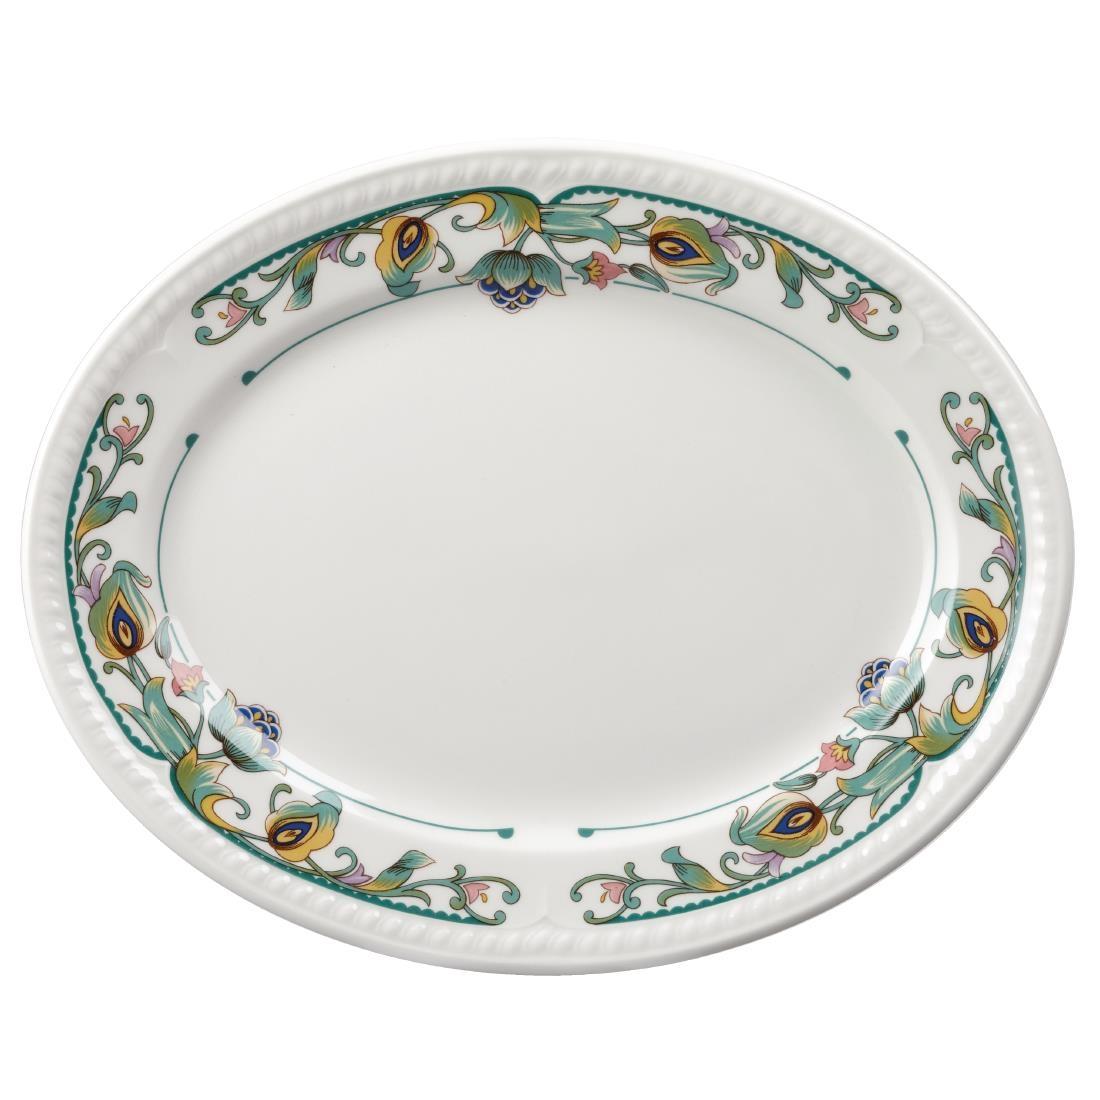 Churchill Buckingham Sumatra Oval Platters 254mm (Pack of 12) (M501)